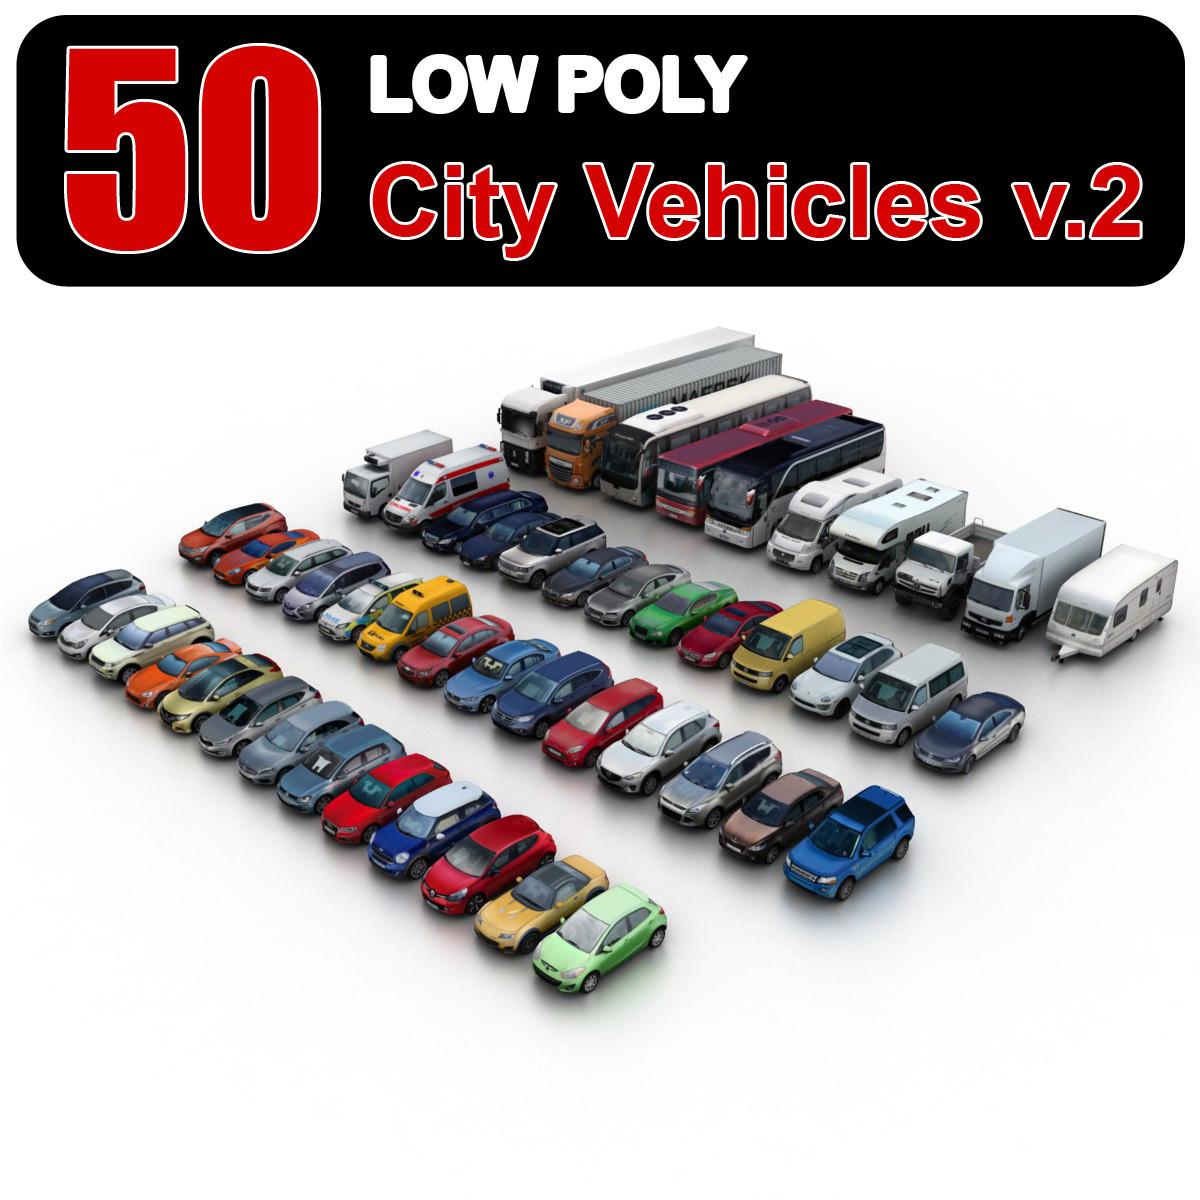 Free 3d models low poly - 6